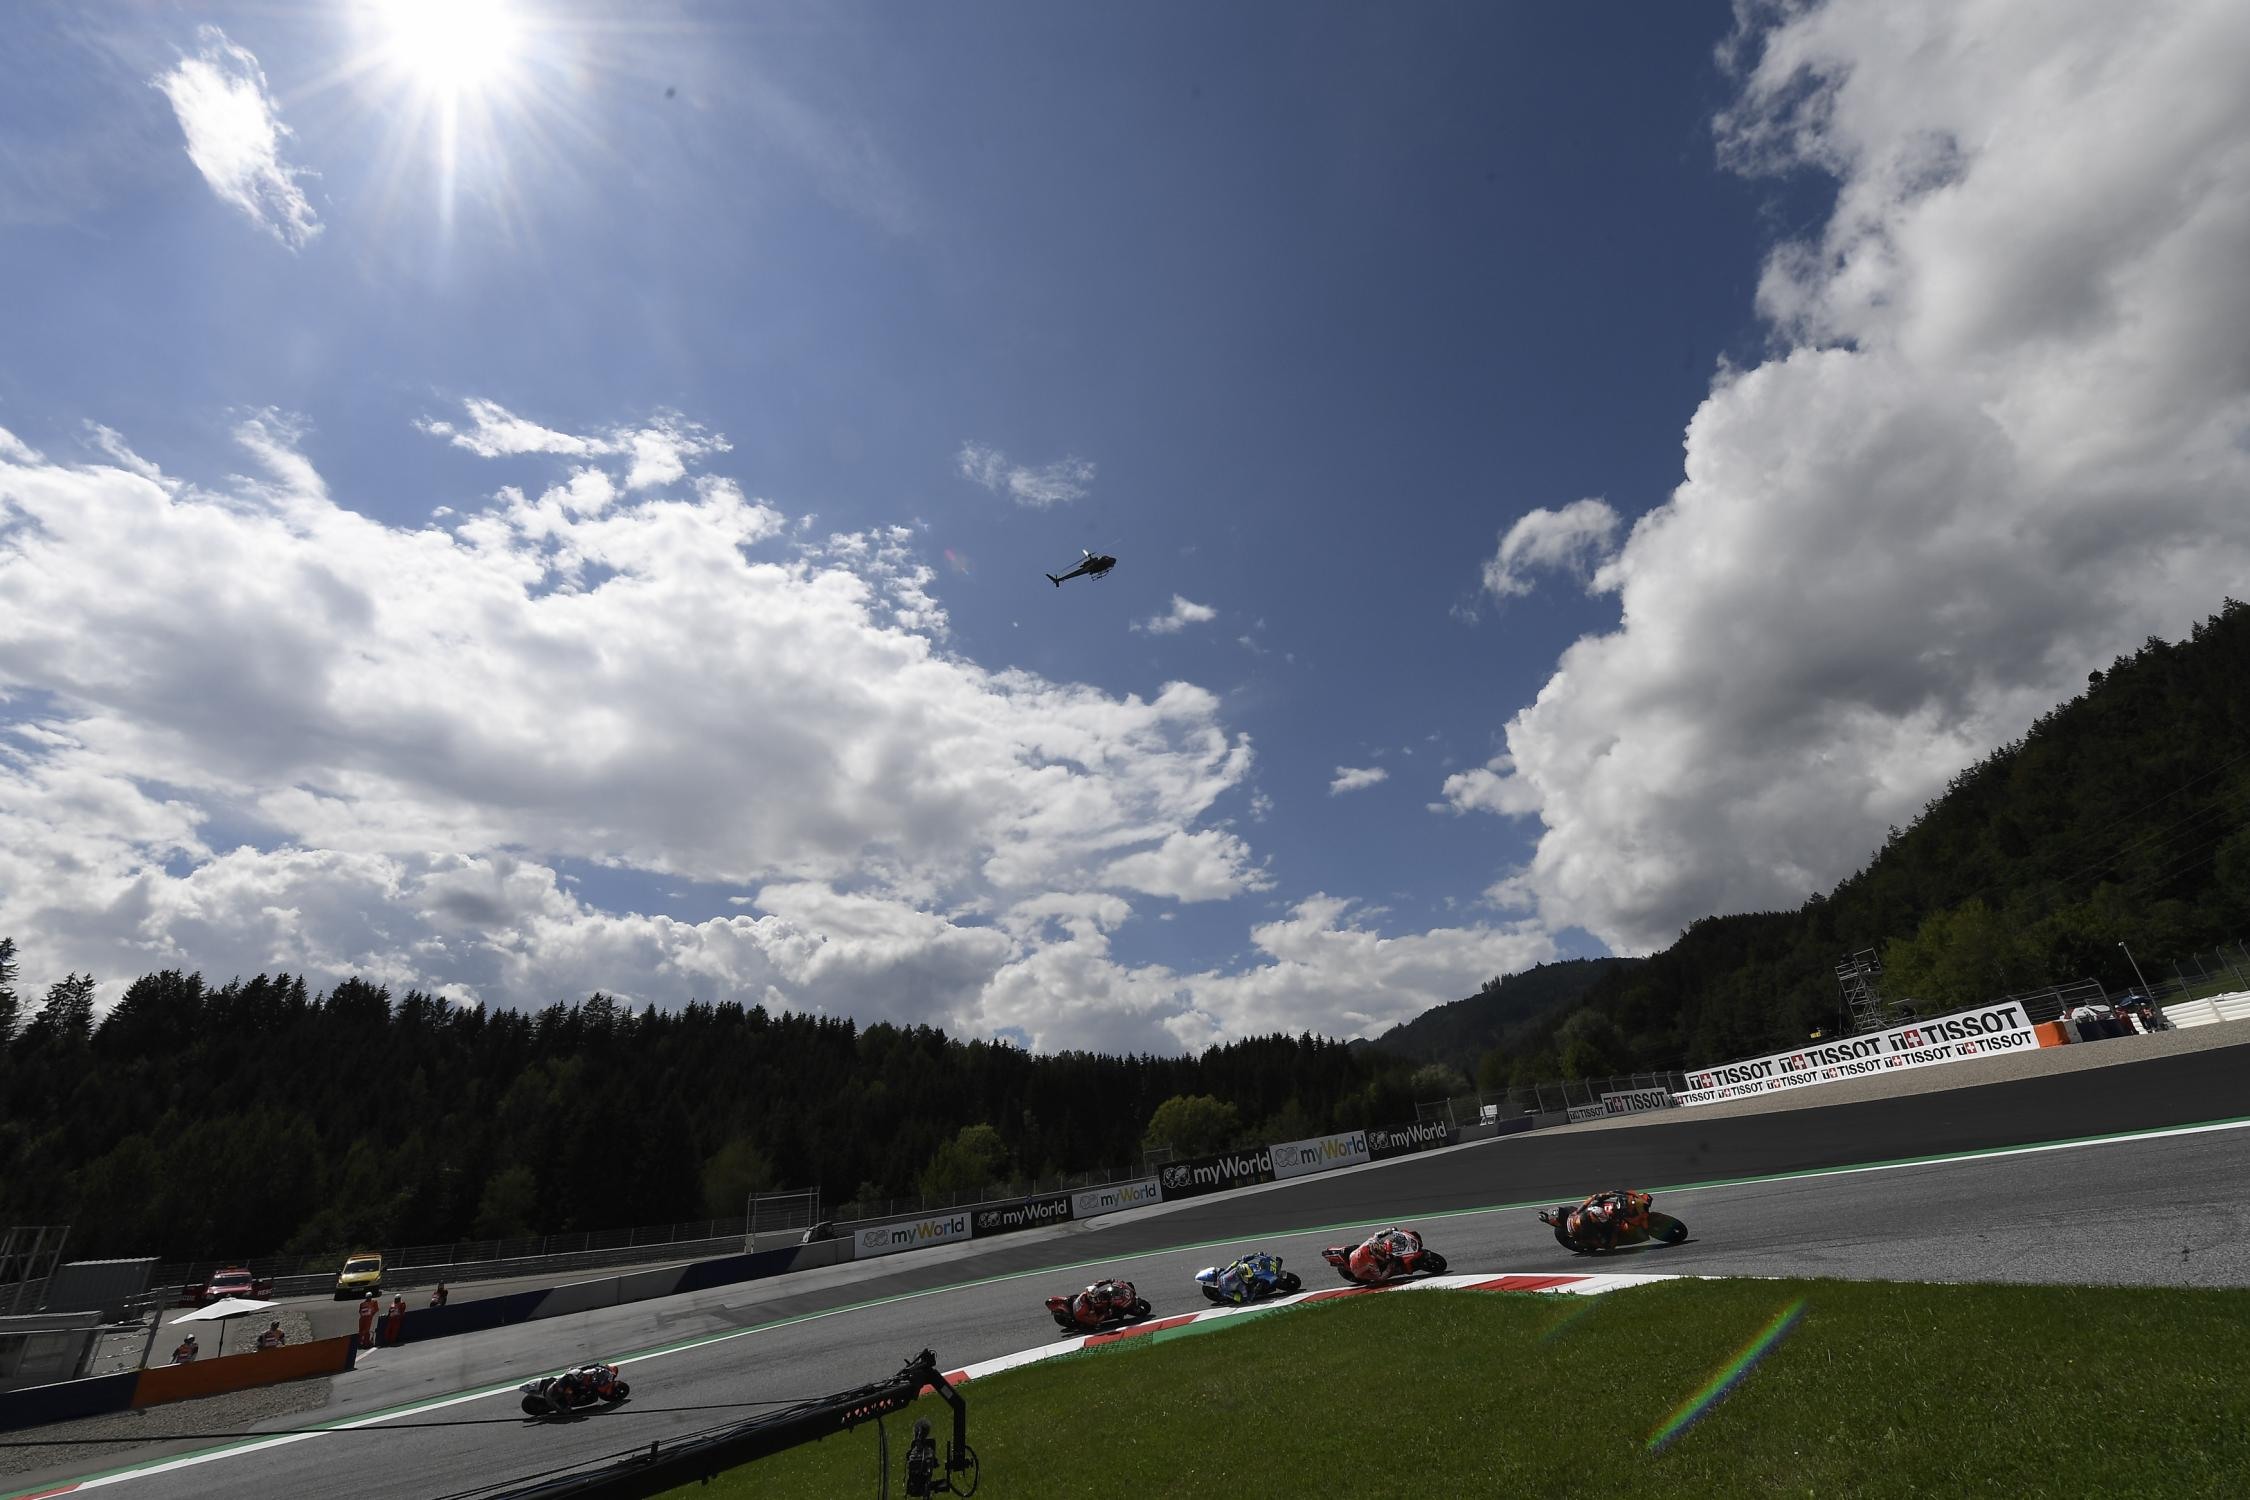 Meteo Red Bull Ring: Previsioni meteo per la gara di MotoGP in Stiria.